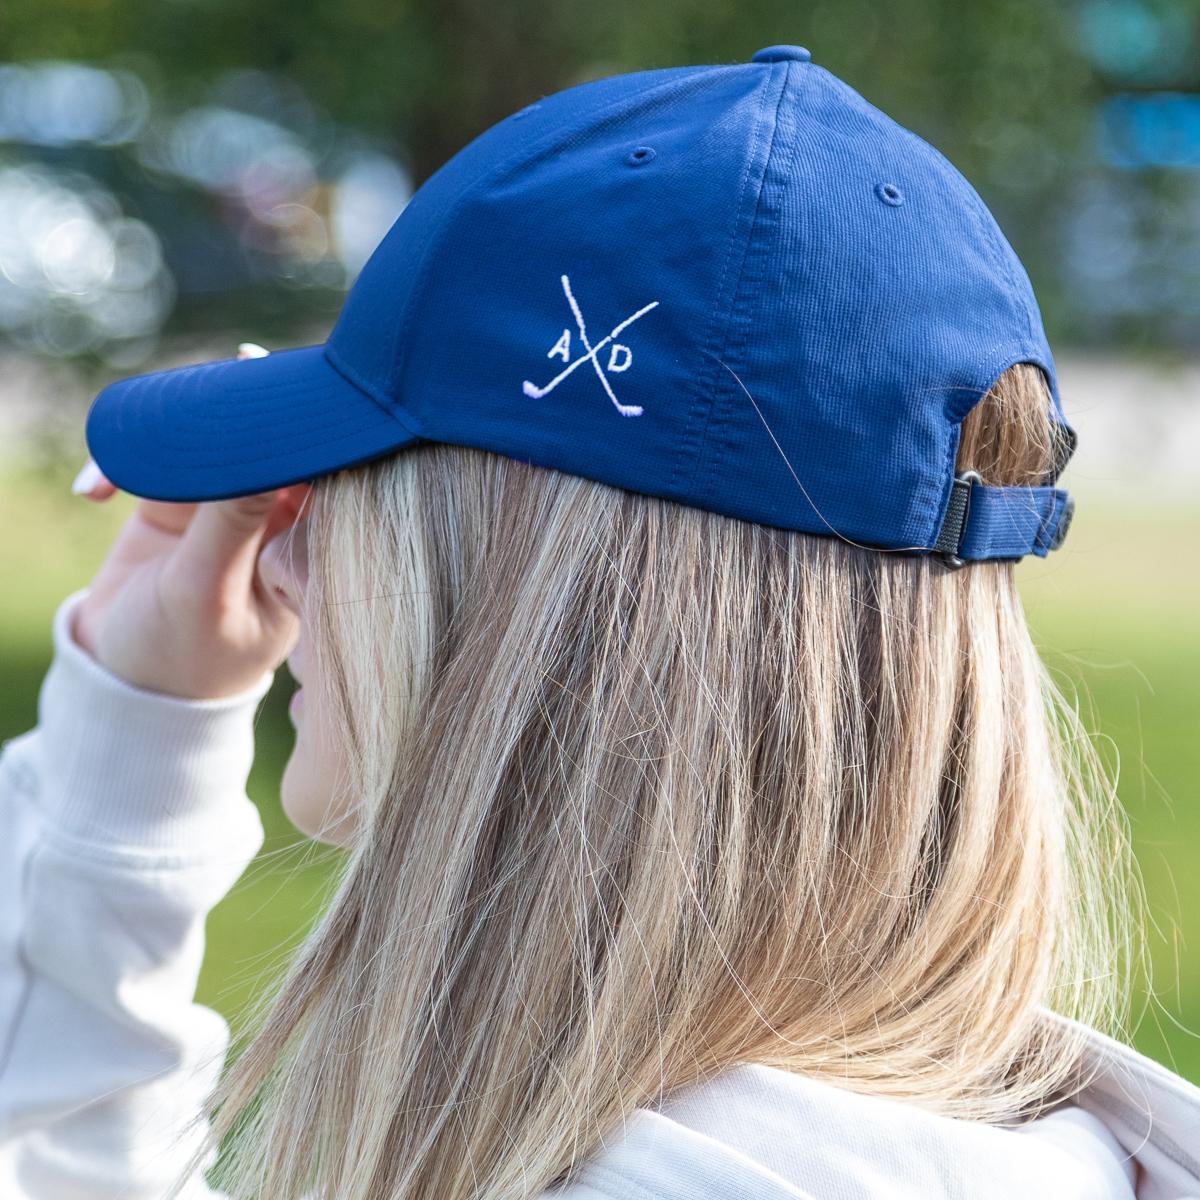 Personalised Golf Caps